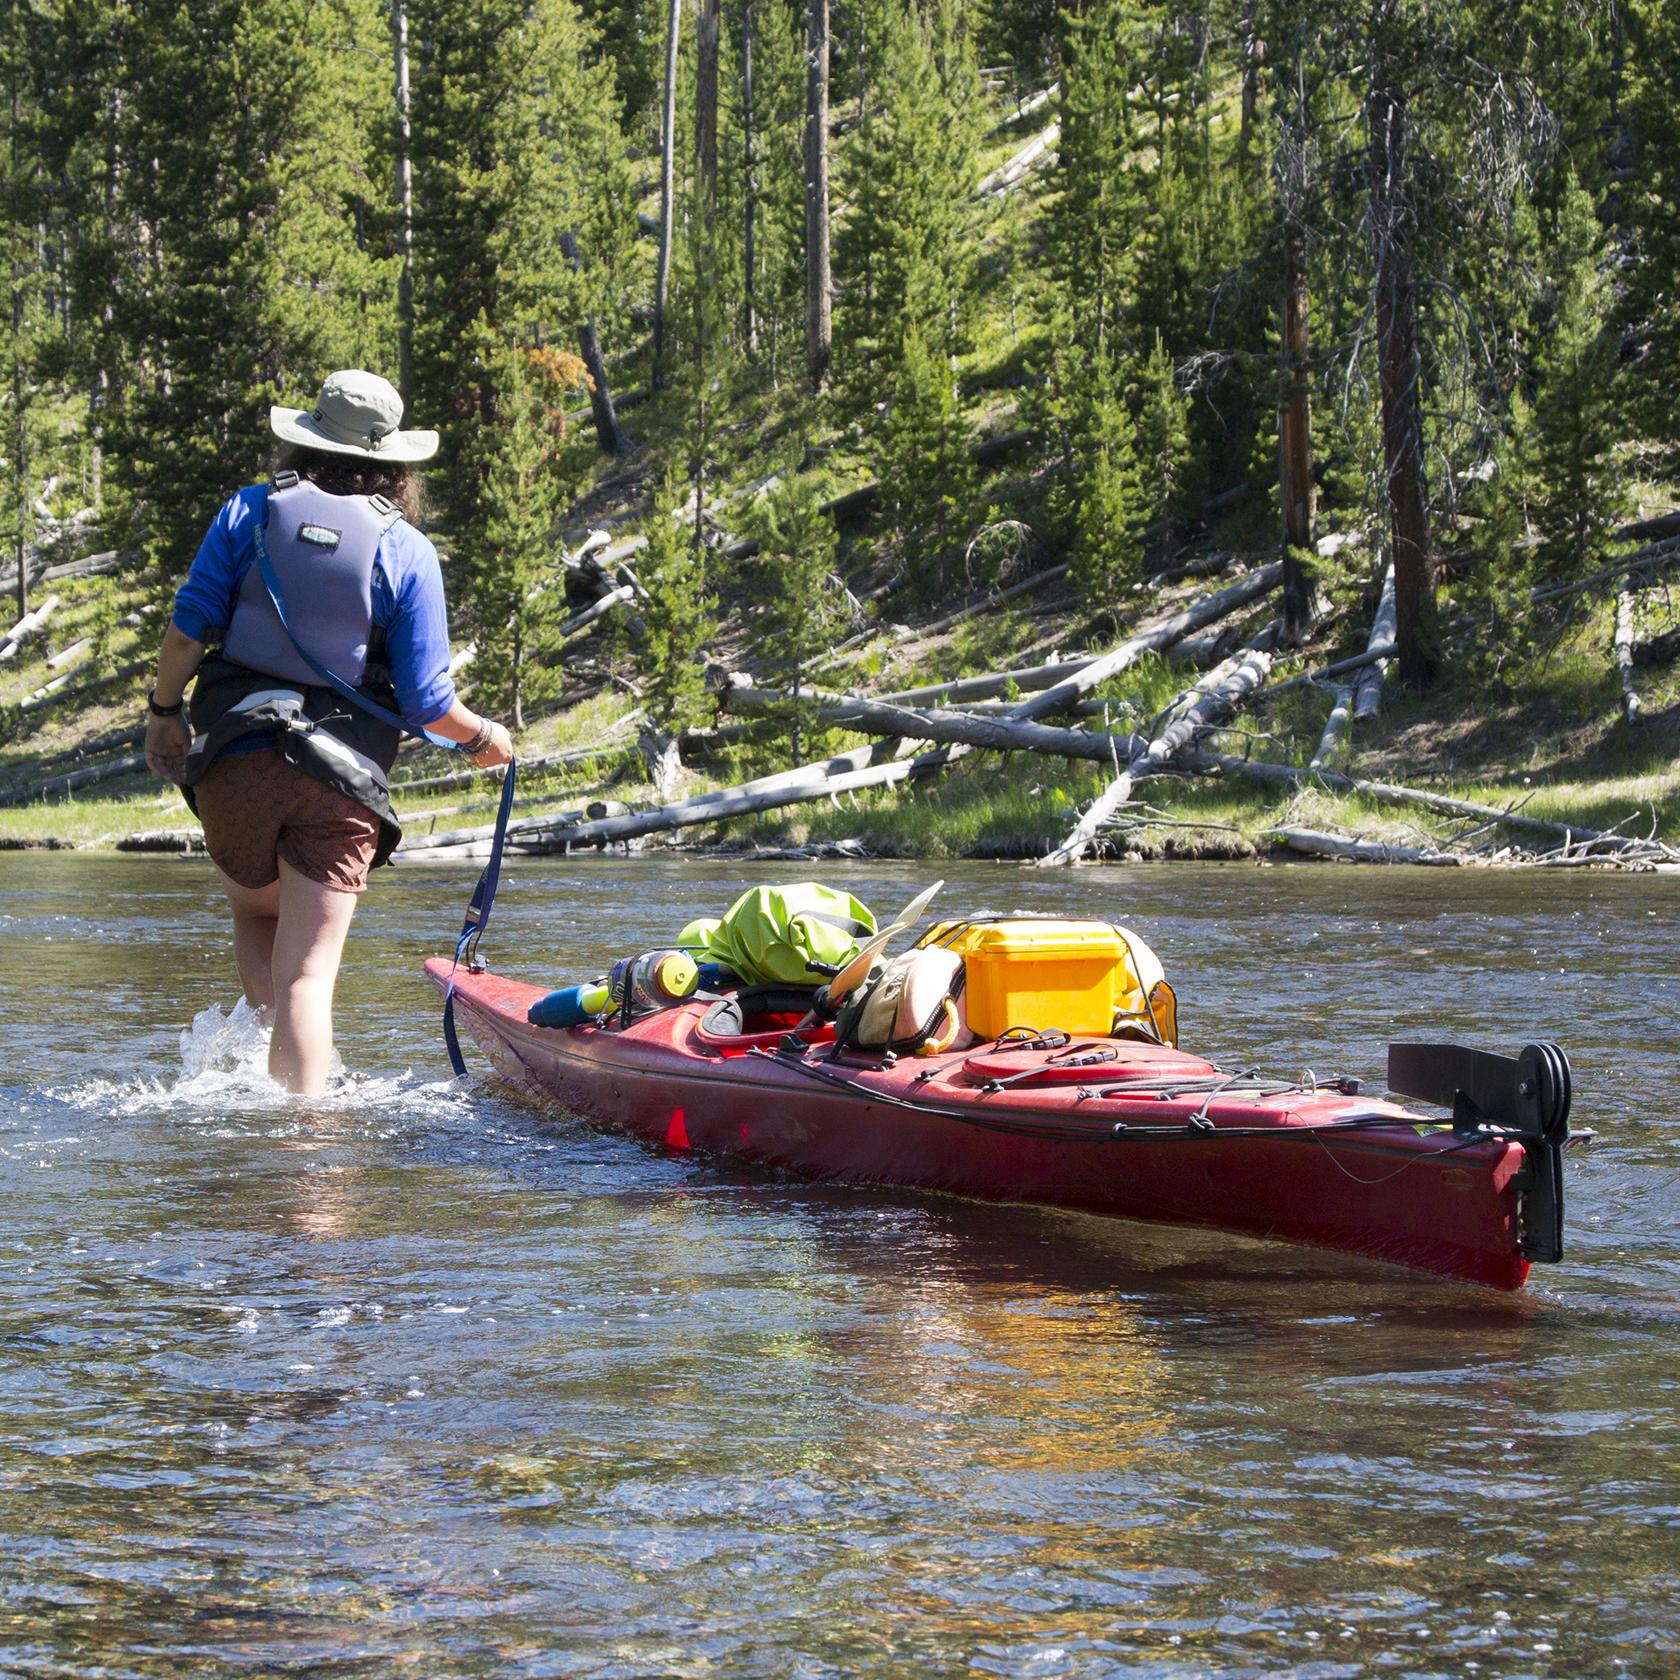 Kayaking on the Jackson Hole High Trails trip